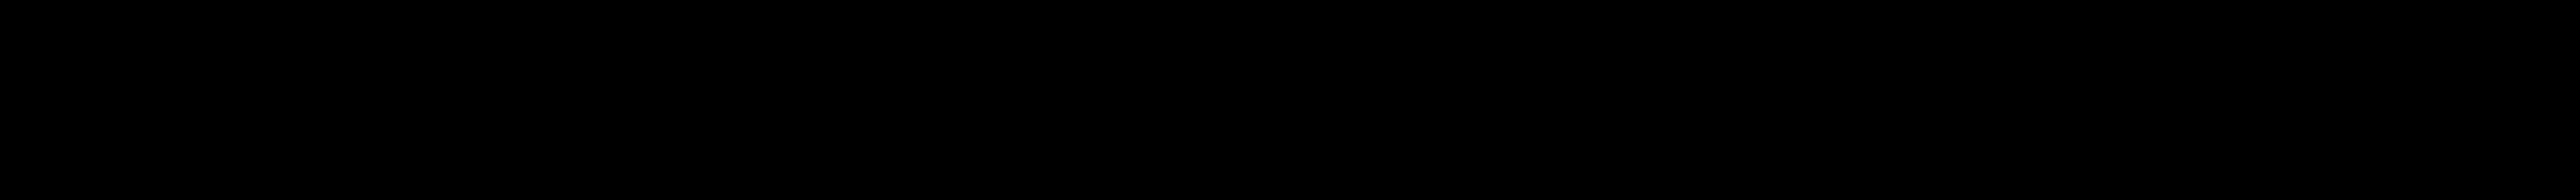 Schwager Sans Black Italic